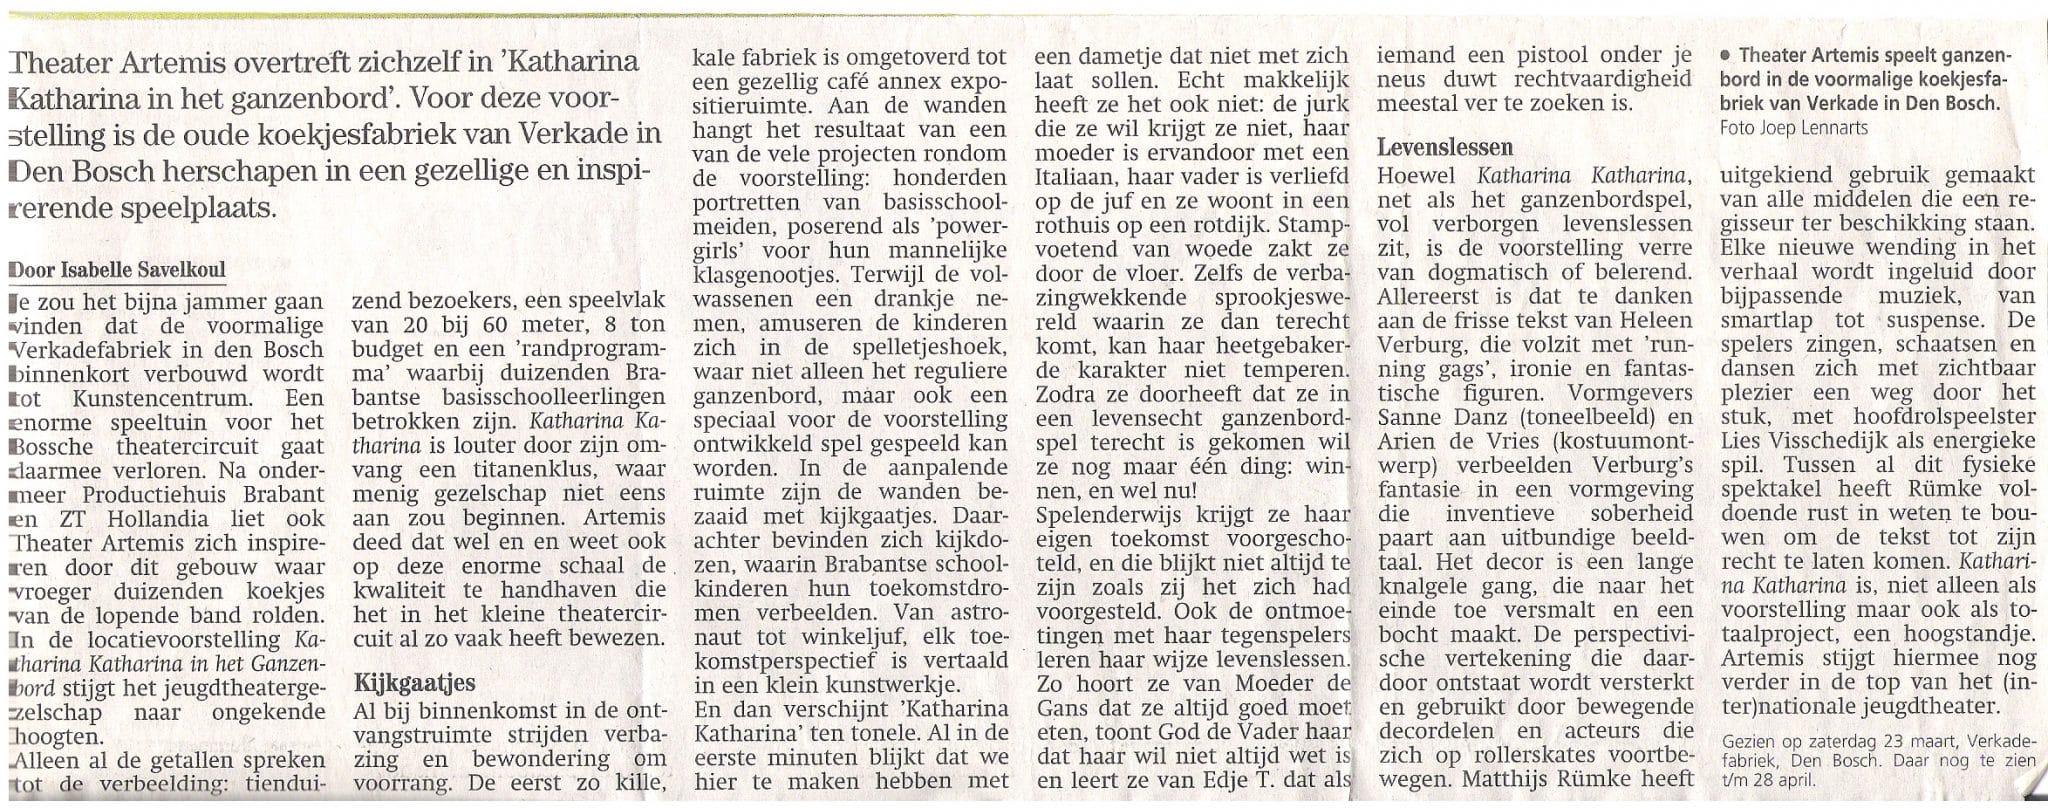 Noord Brabants Dagblad 25 maart 2002